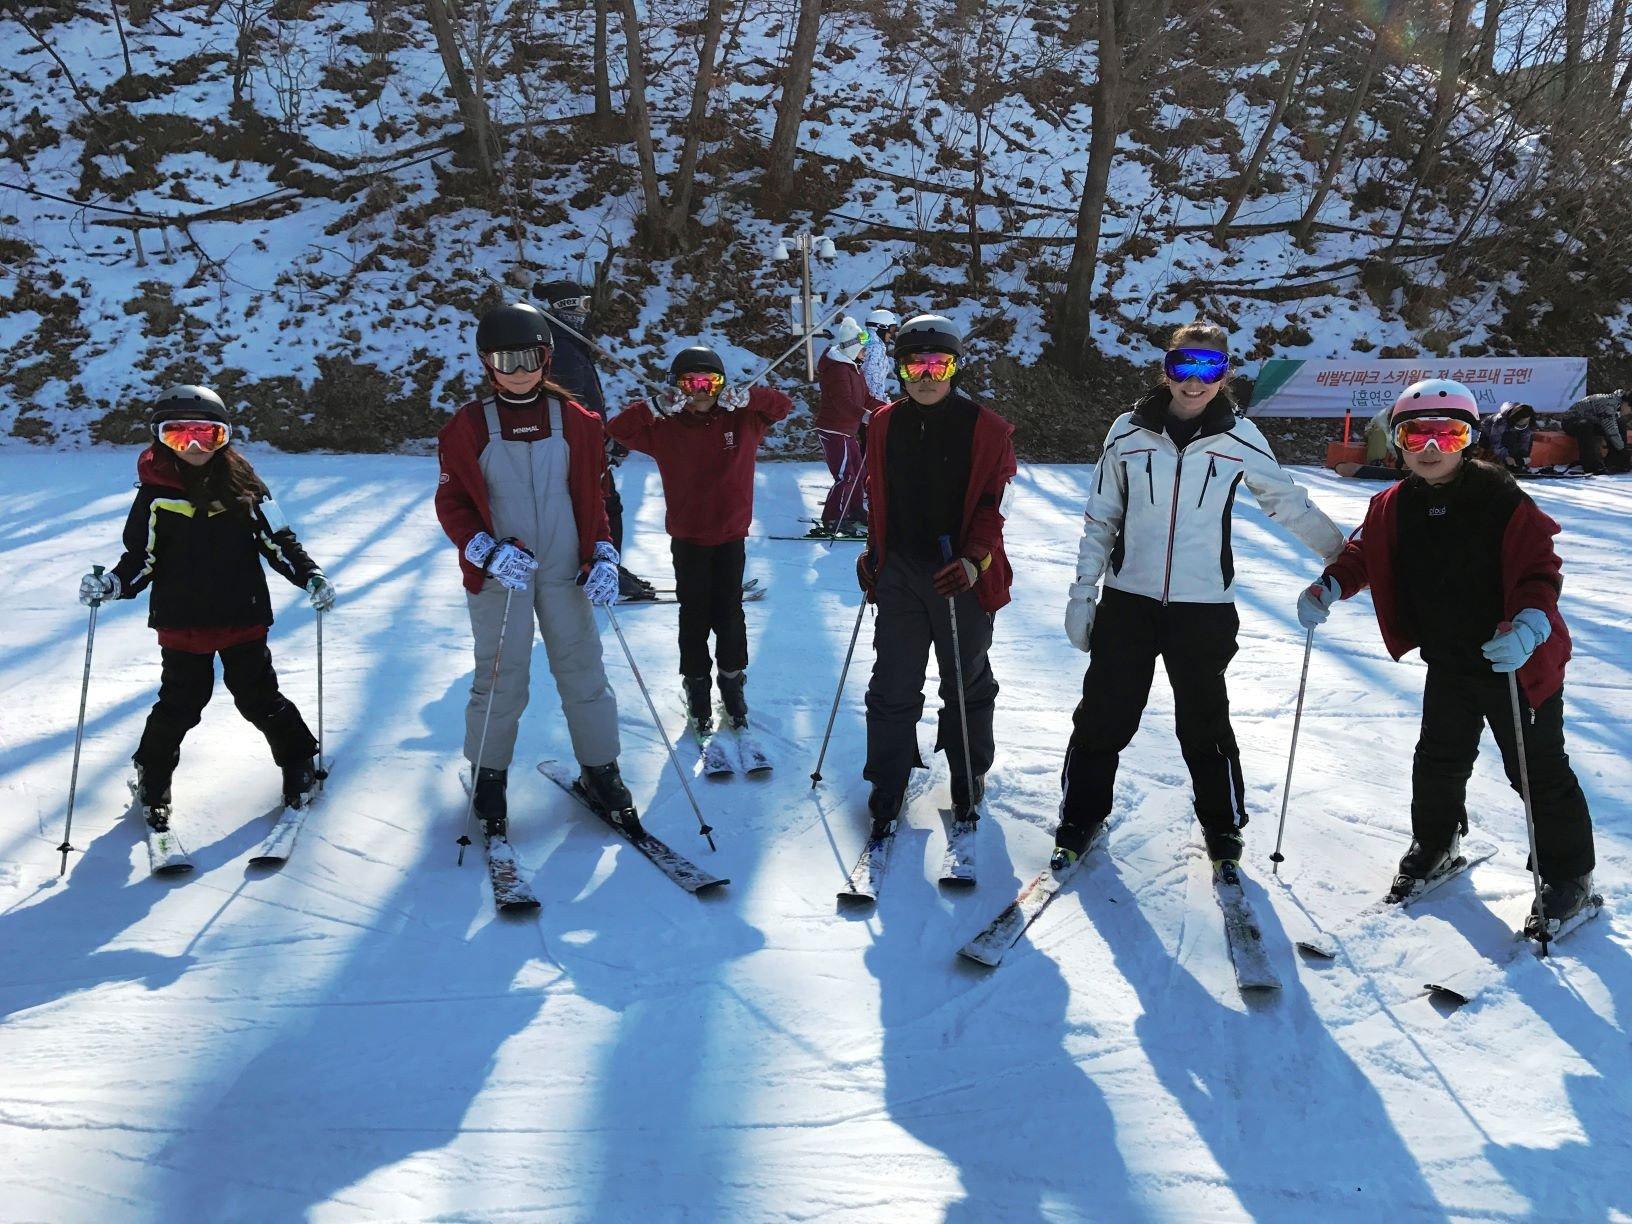 daemyung vivaldi park skiing